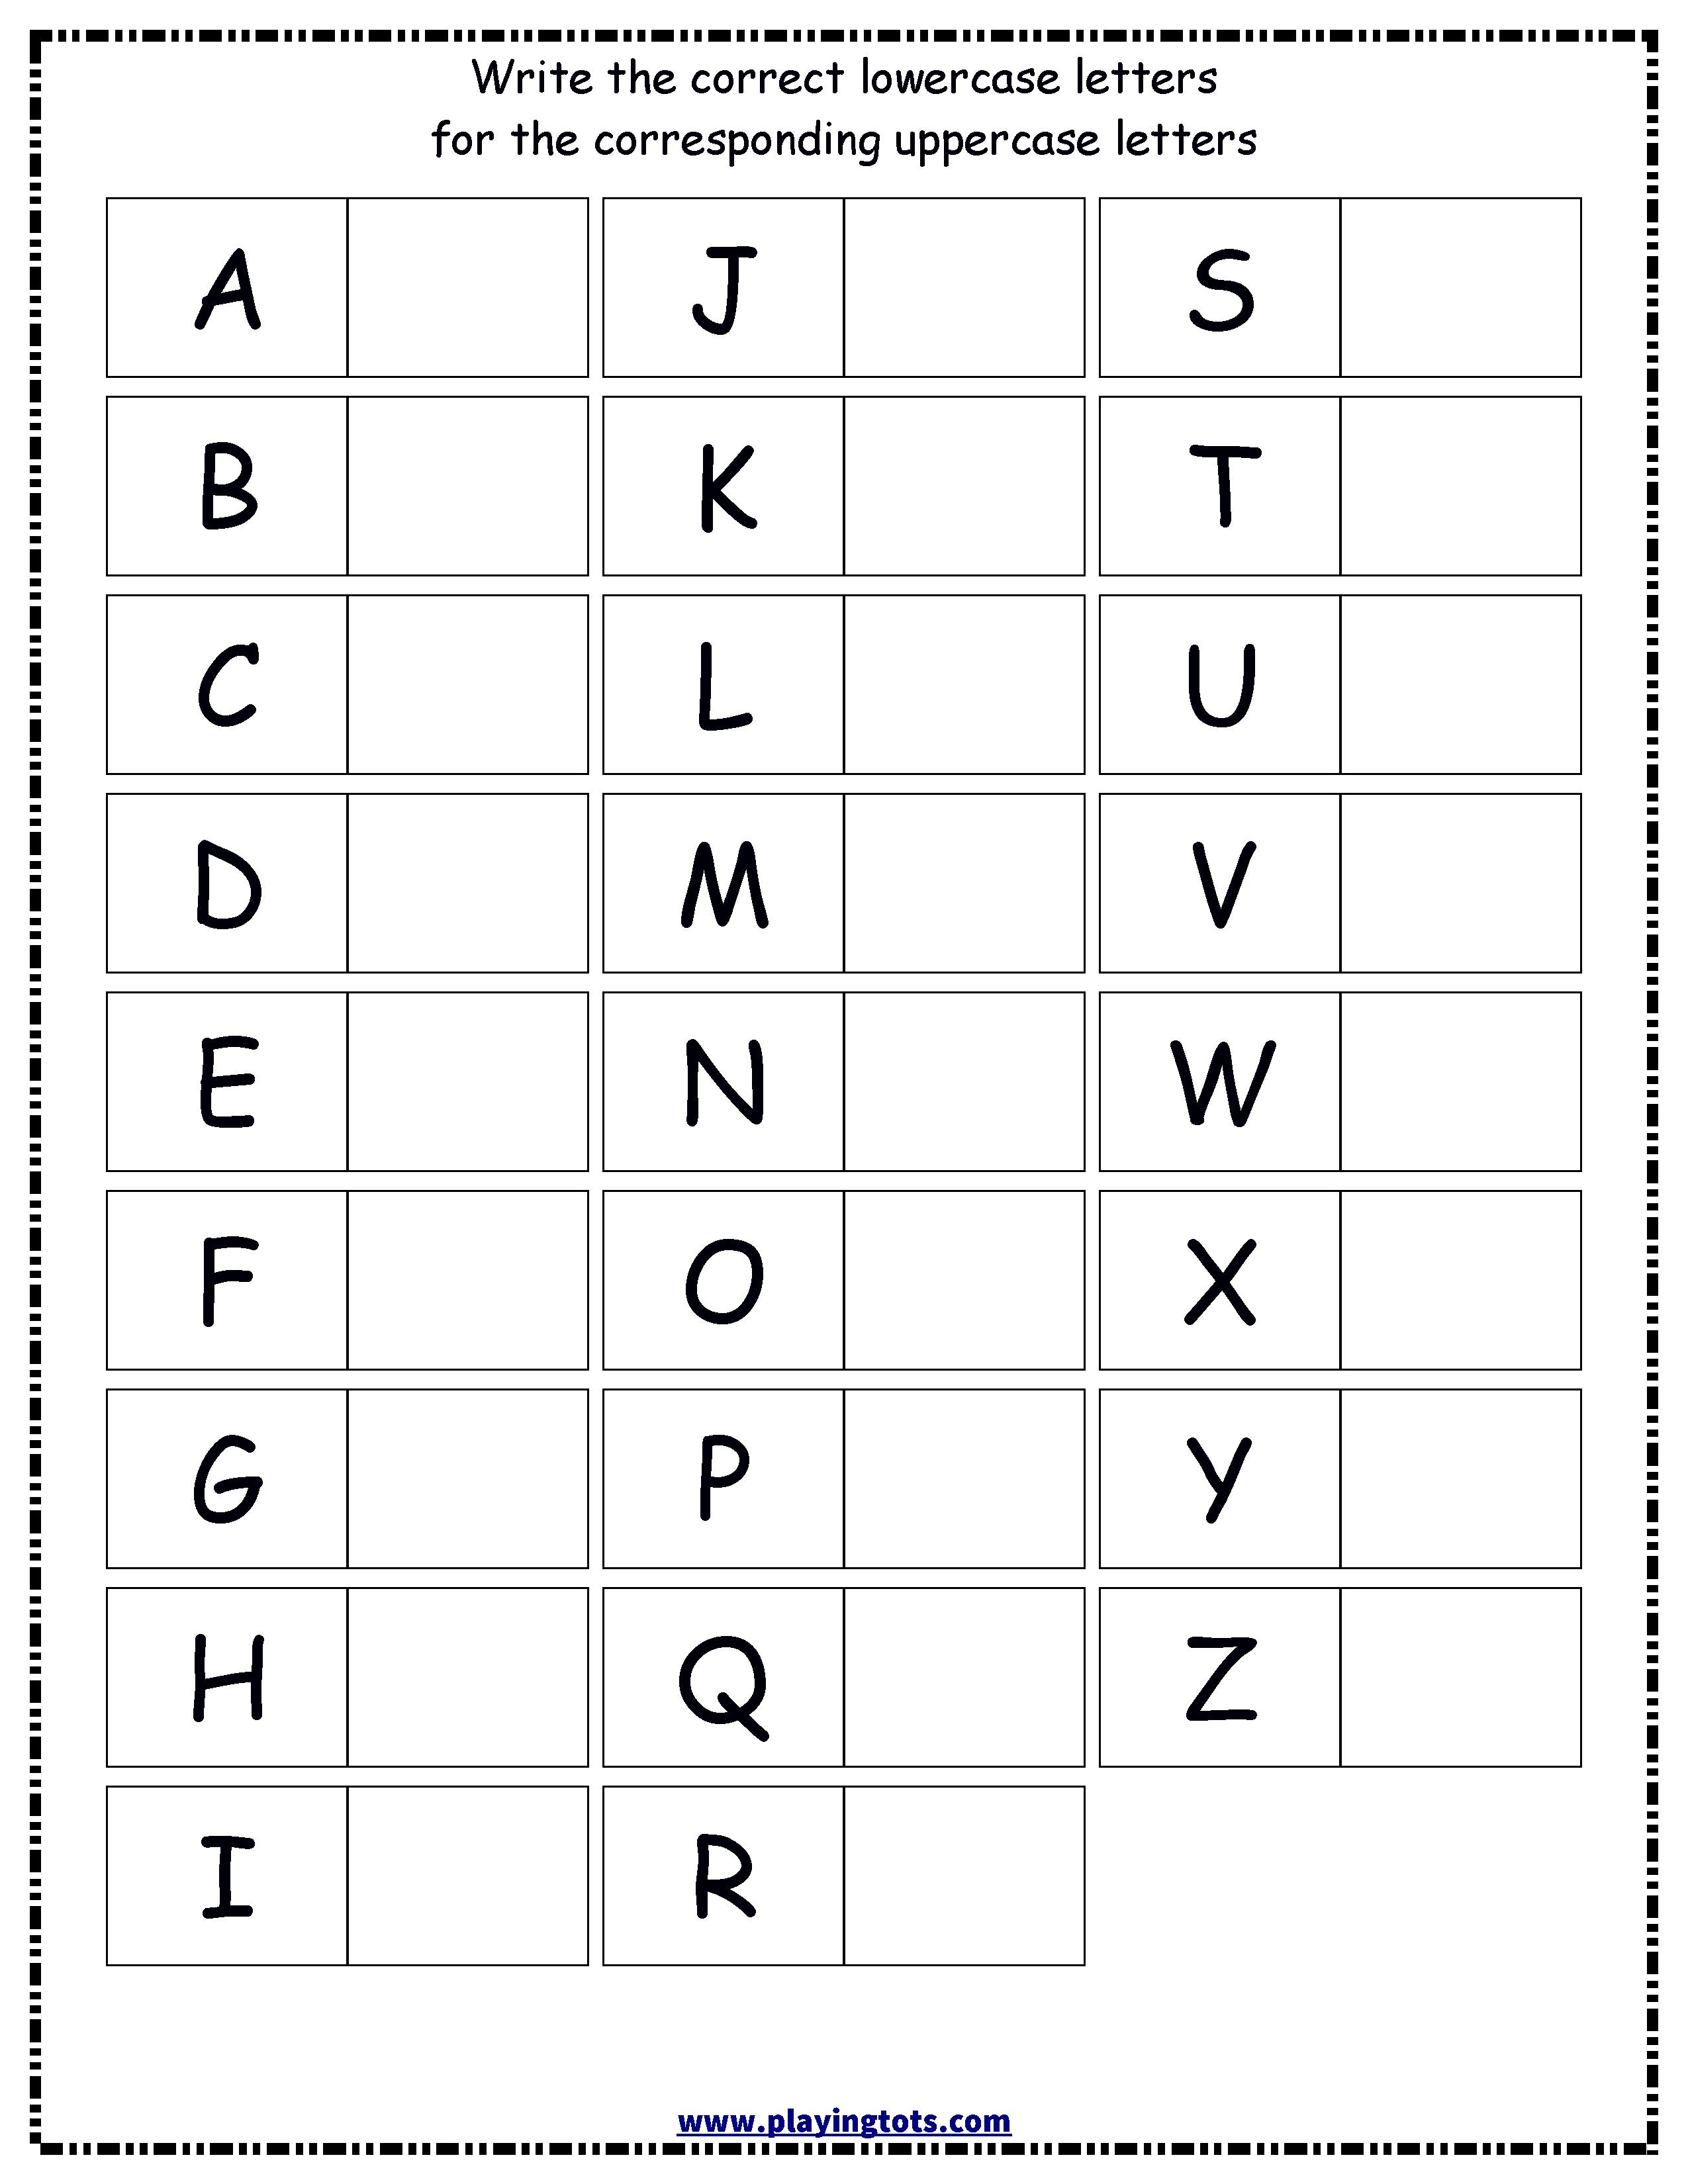 4 Capital And Small Alphabets Worksheets Free Printable Alphabet W Printable Alphabet Worksheets Alphabet Worksheets Kindergarten Alphabet Worksheets Preschool [ 3300 x 2550 Pixel ]